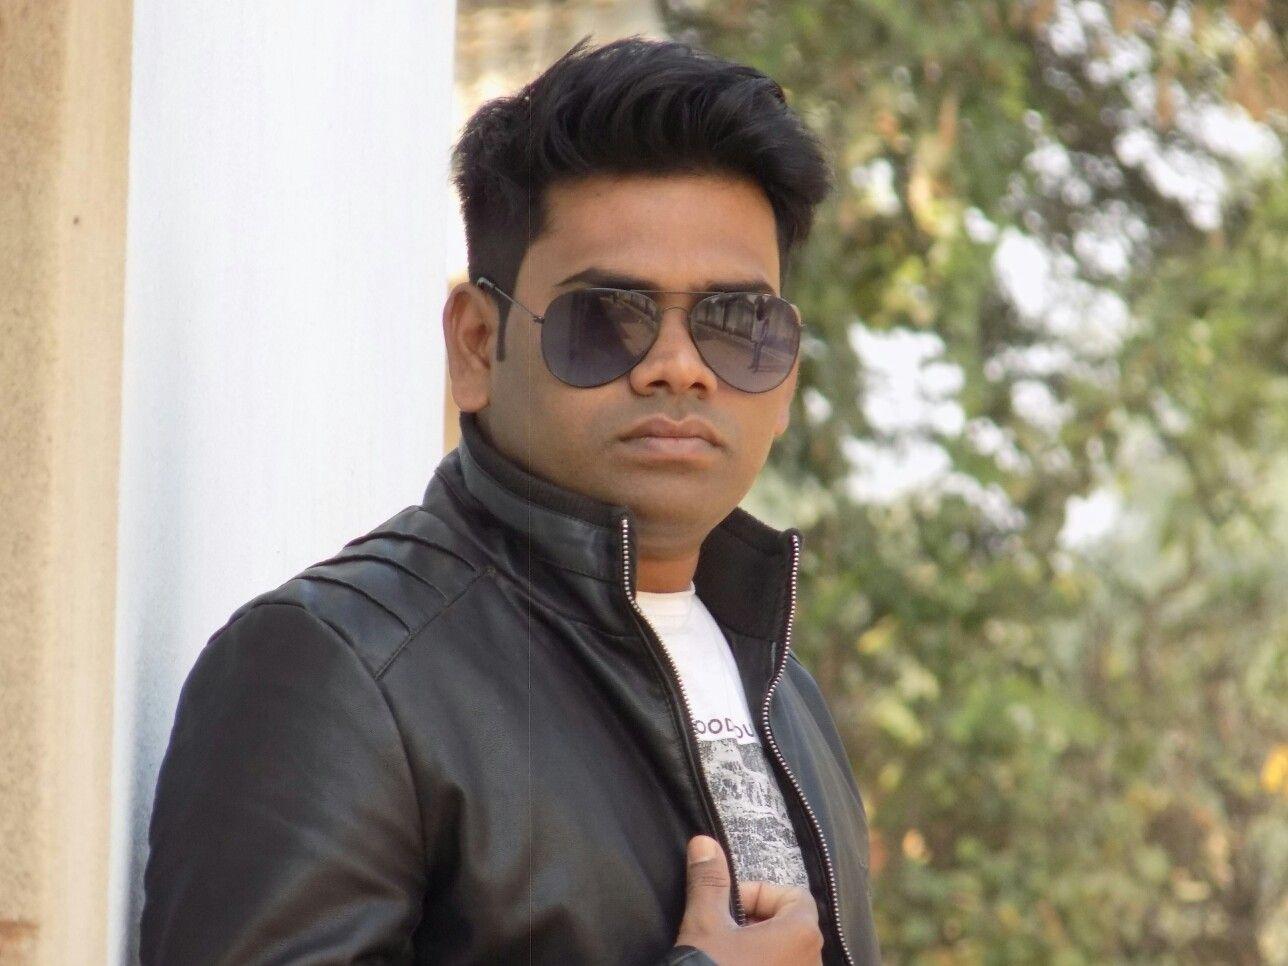 Pin by Aditya ranjan deep on 2016 photos Mens sunglasses